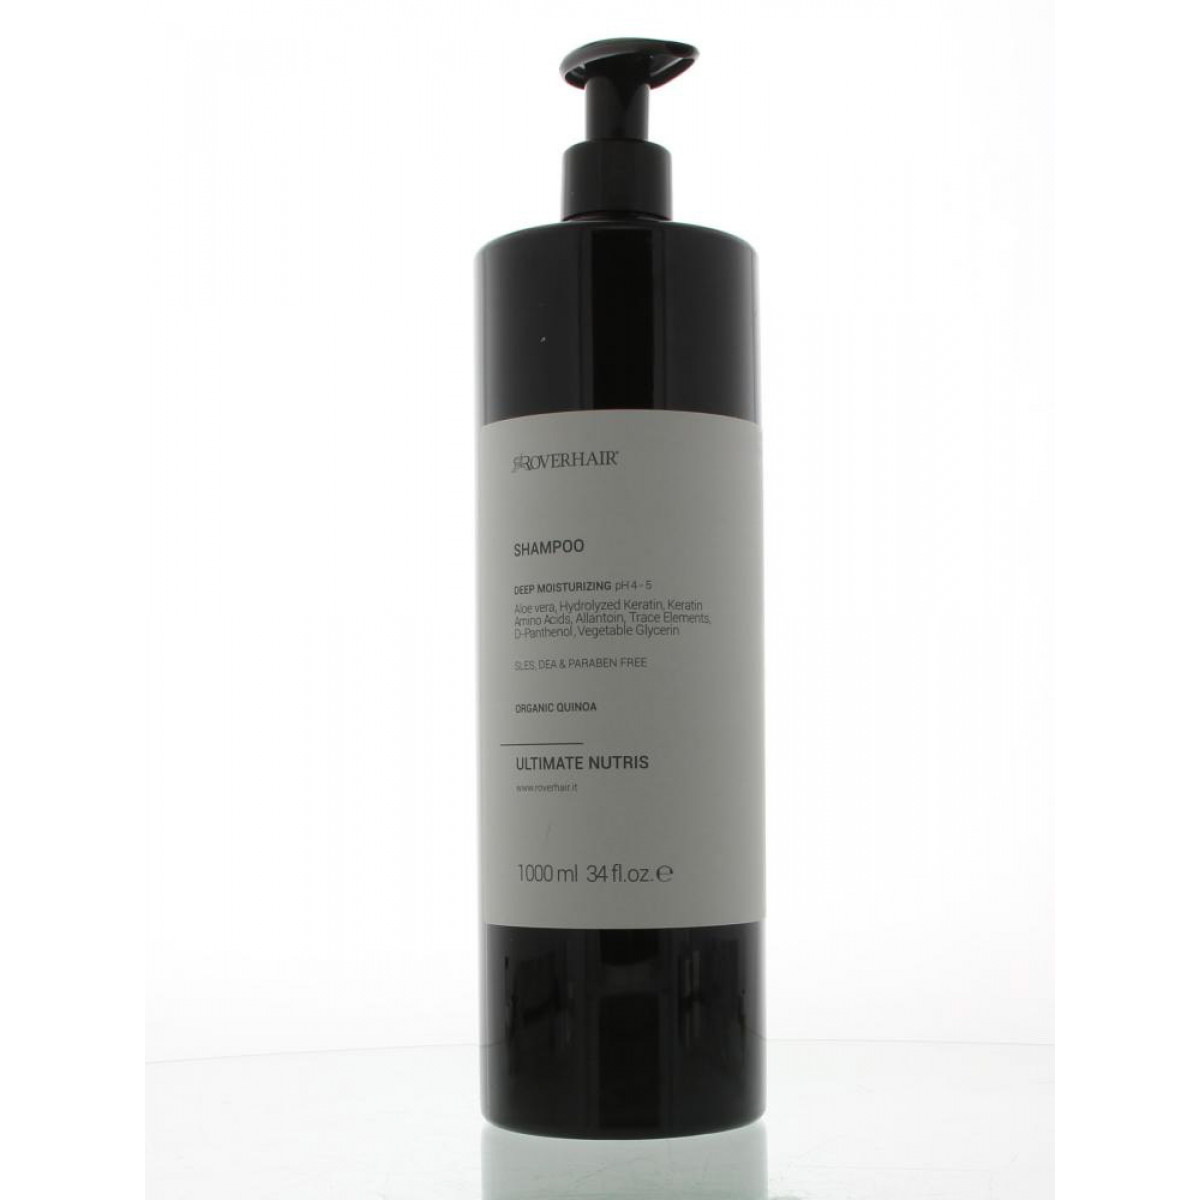 Roverhair Ultimate Nutris Deep Moisturizing Shampoo Droog/Beschadigd Haar Image